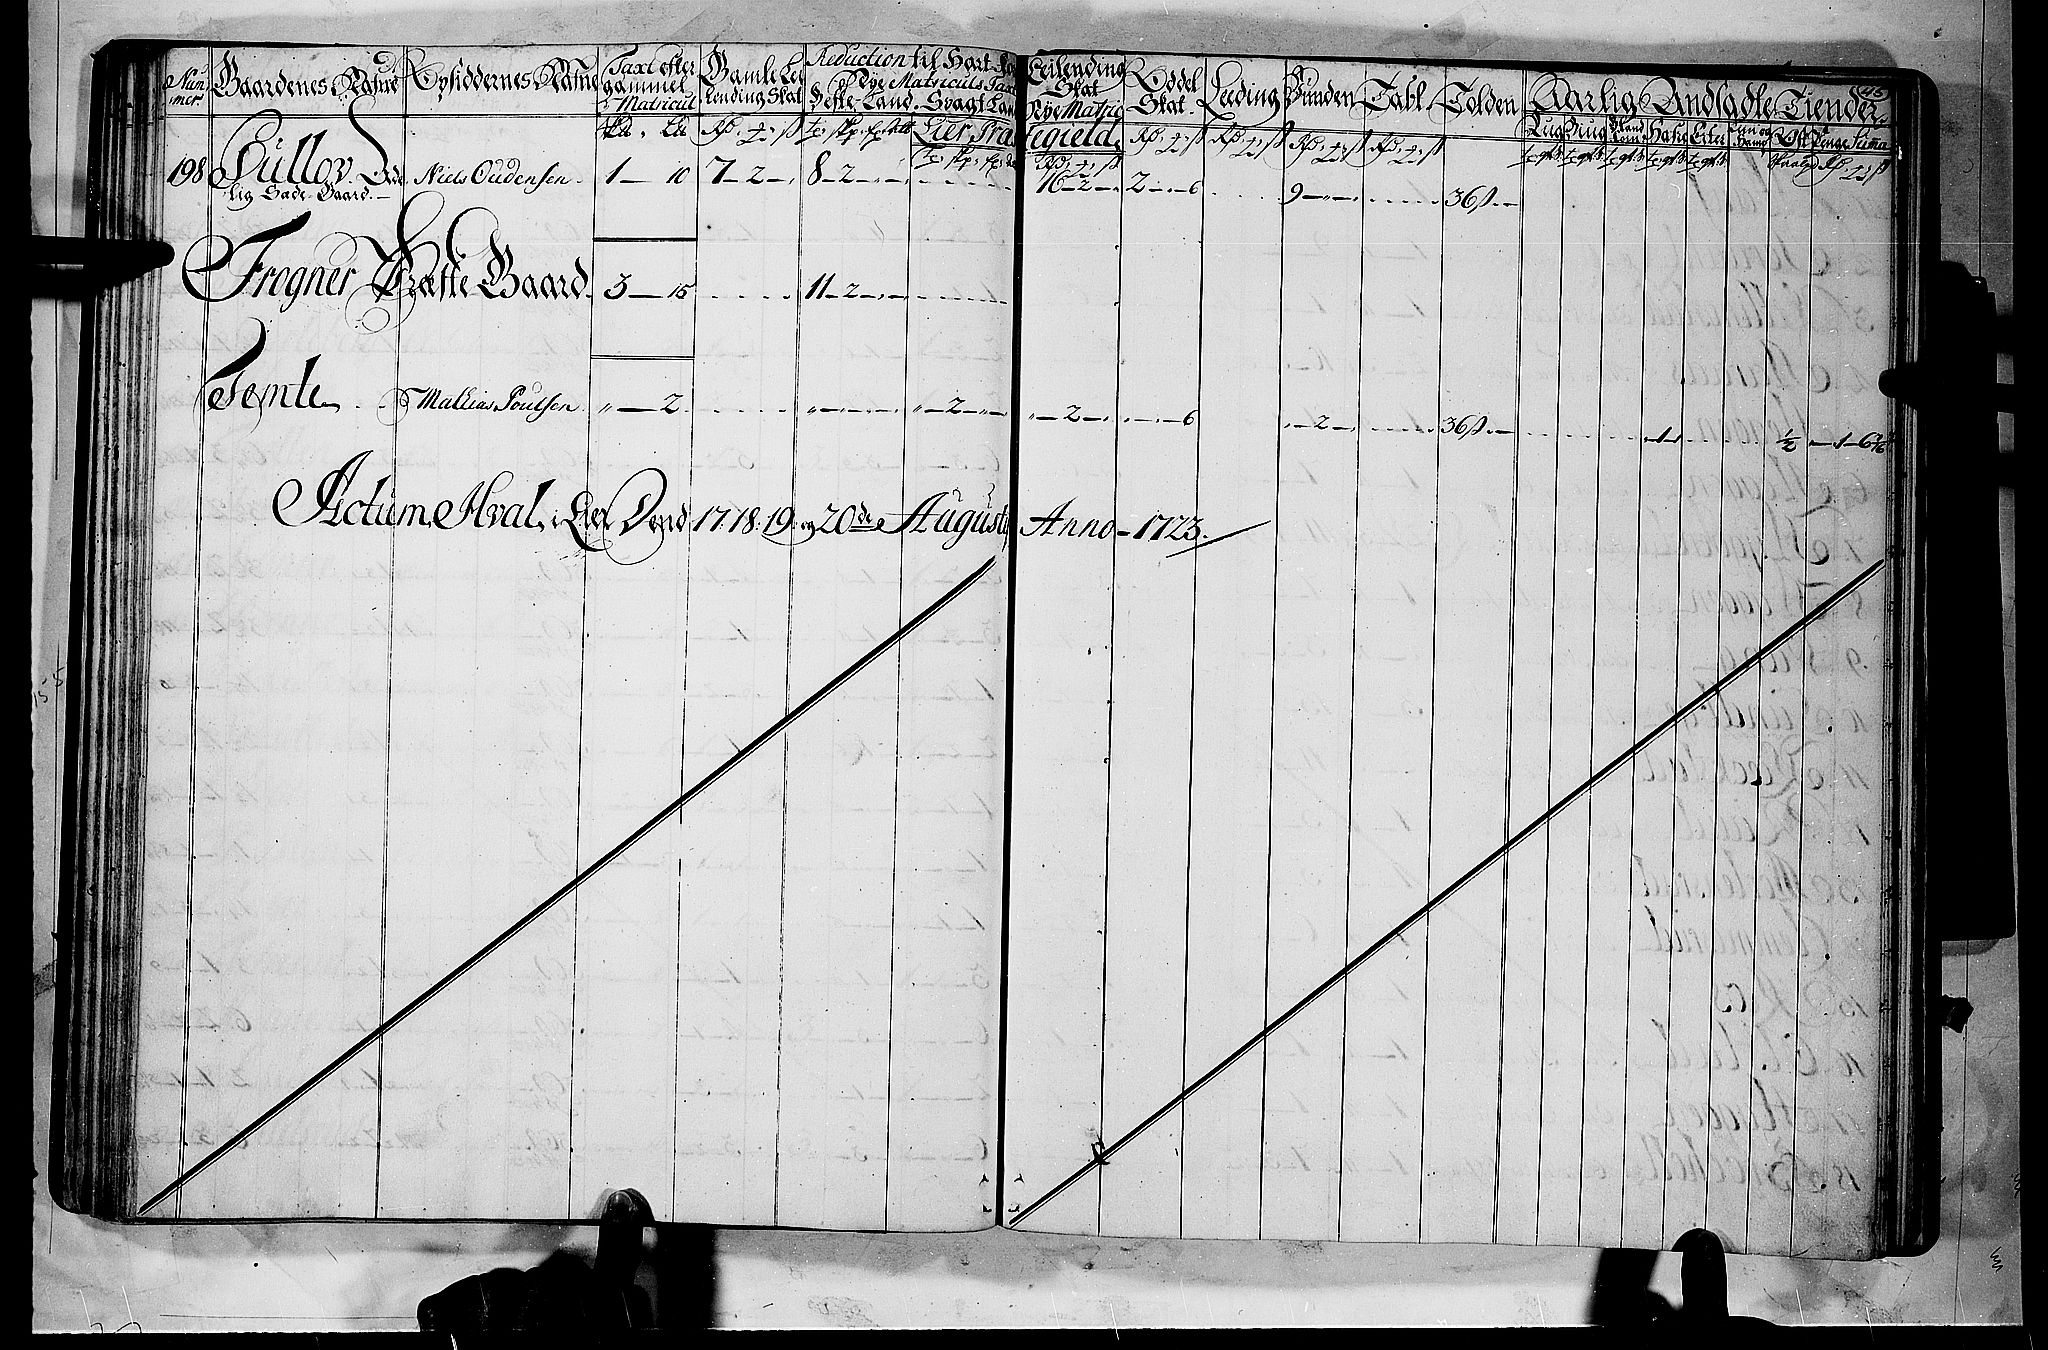 RA, Rentekammeret inntil 1814, Realistisk ordnet avdeling, N/Nb/Nbf/L0112: Buskerud matrikkelprotokoll, 1723, s. 47